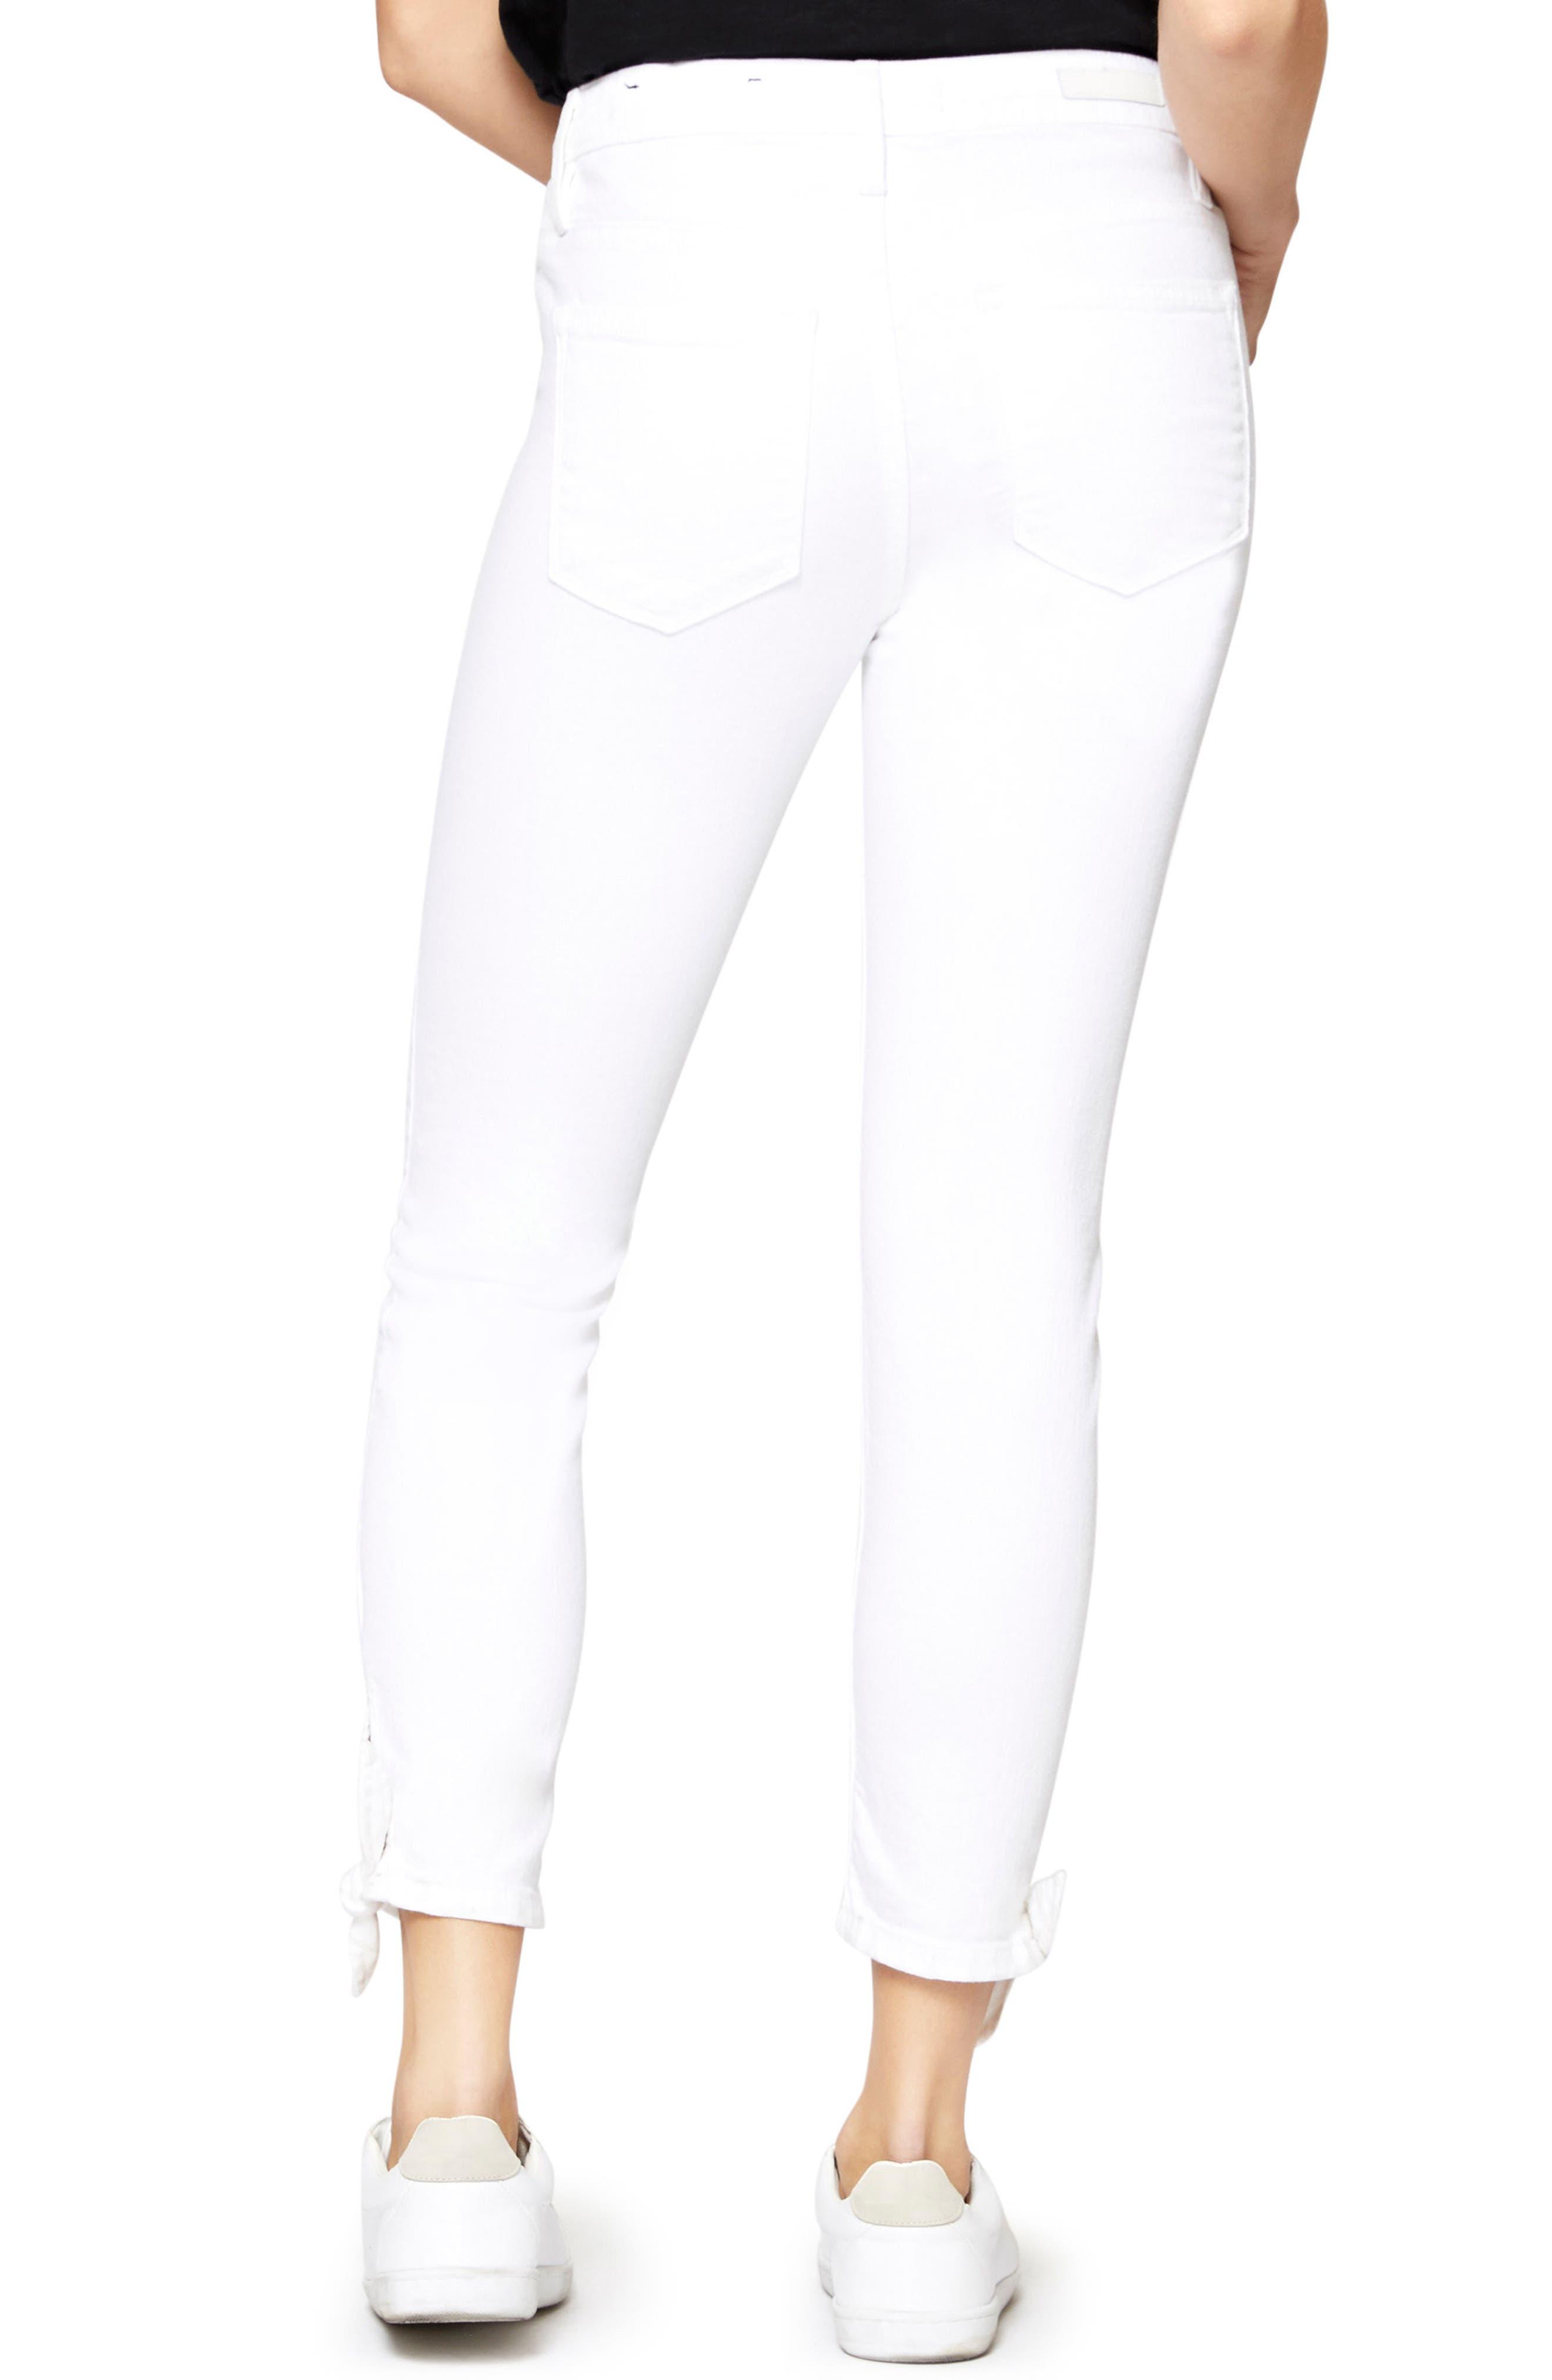 Robbie Ankle Tie Jeans,                             Alternate thumbnail 2, color,                             White